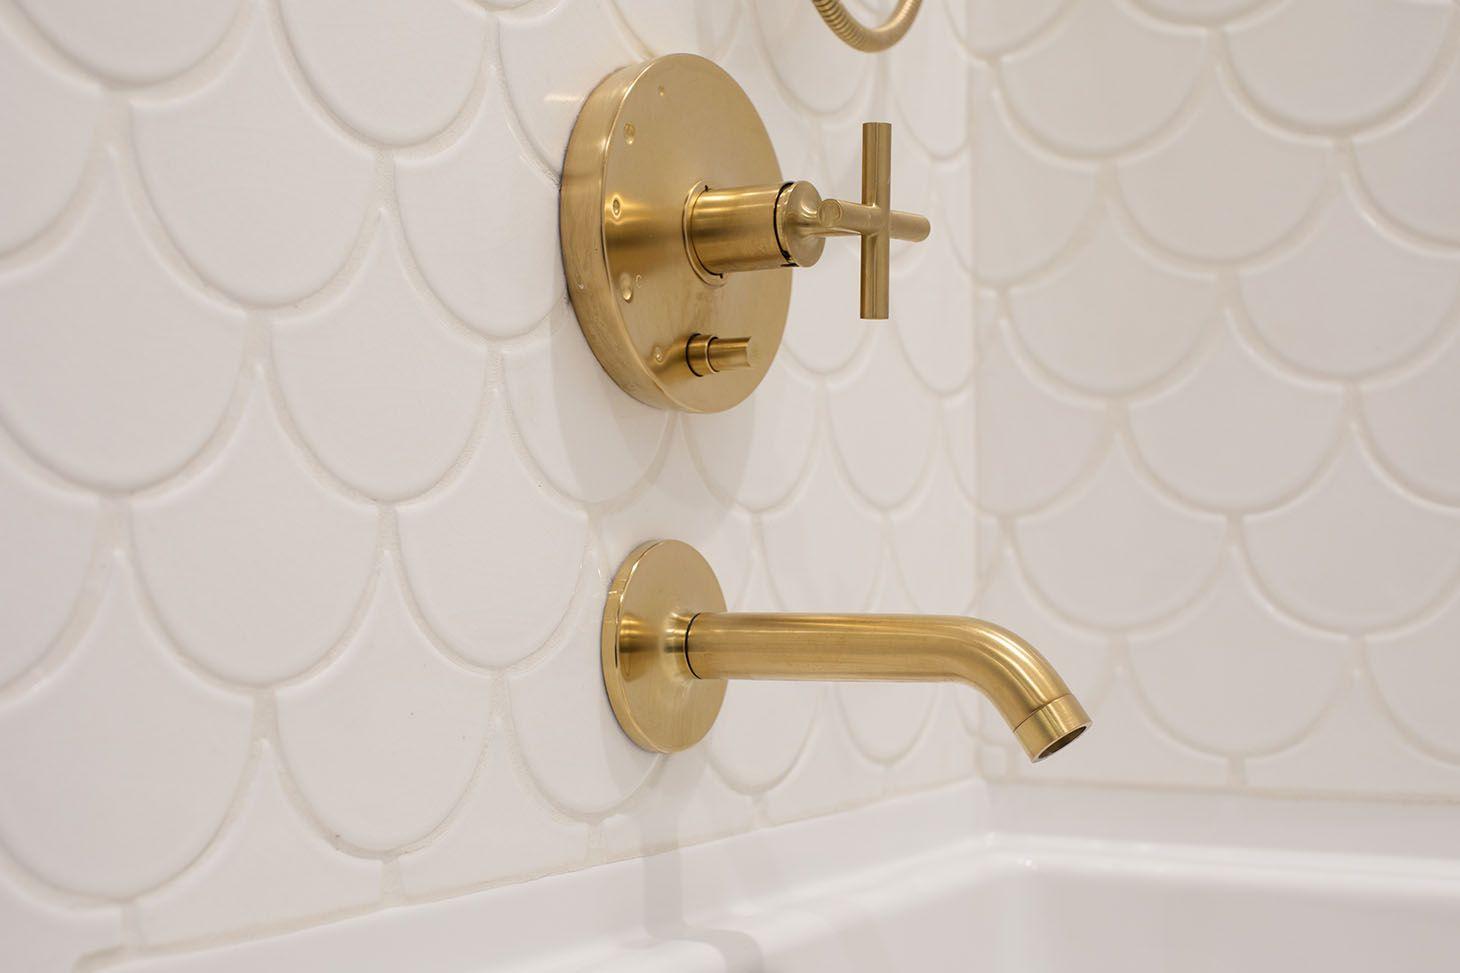 Home Tour Series: Leo's Bedroom & Bathroom